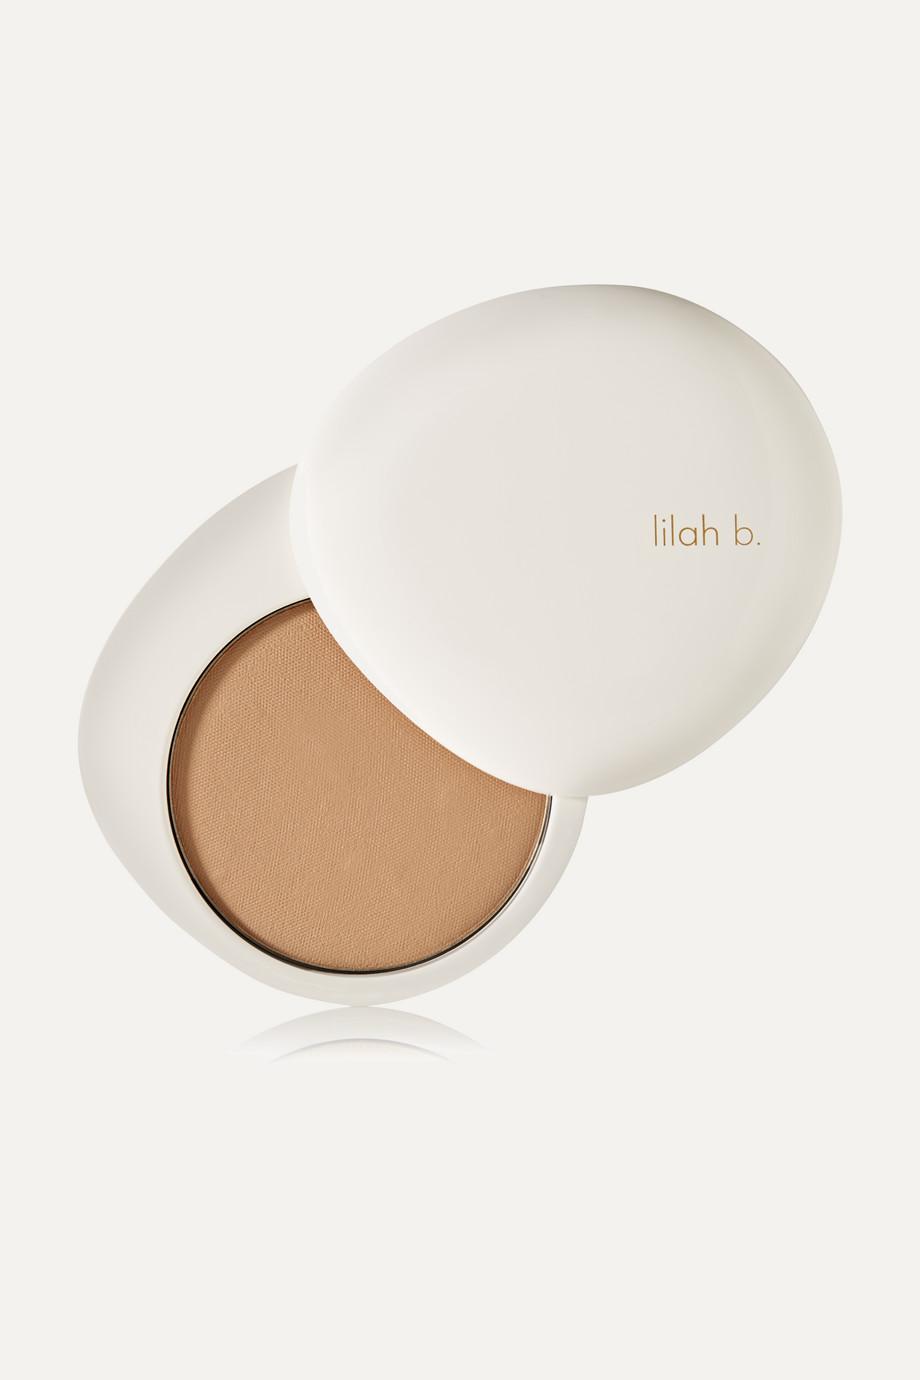 Lilah B. Flawless Finish Foundation - b.classic